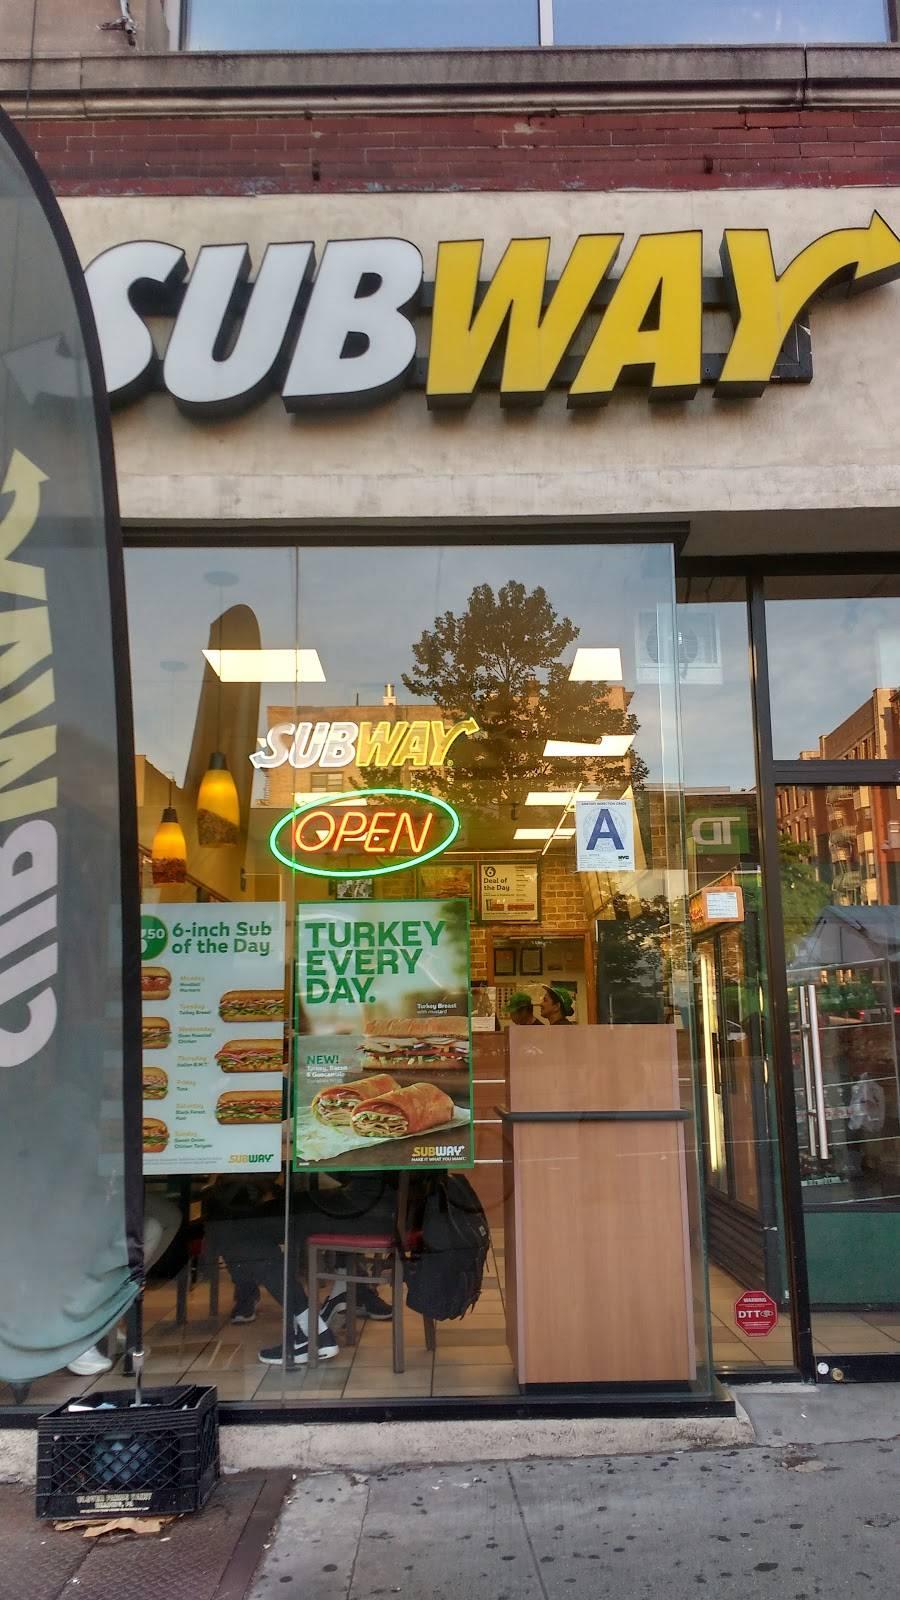 Subway Restaurants | restaurant | 3795 Broadway, New York, NY 10032, USA